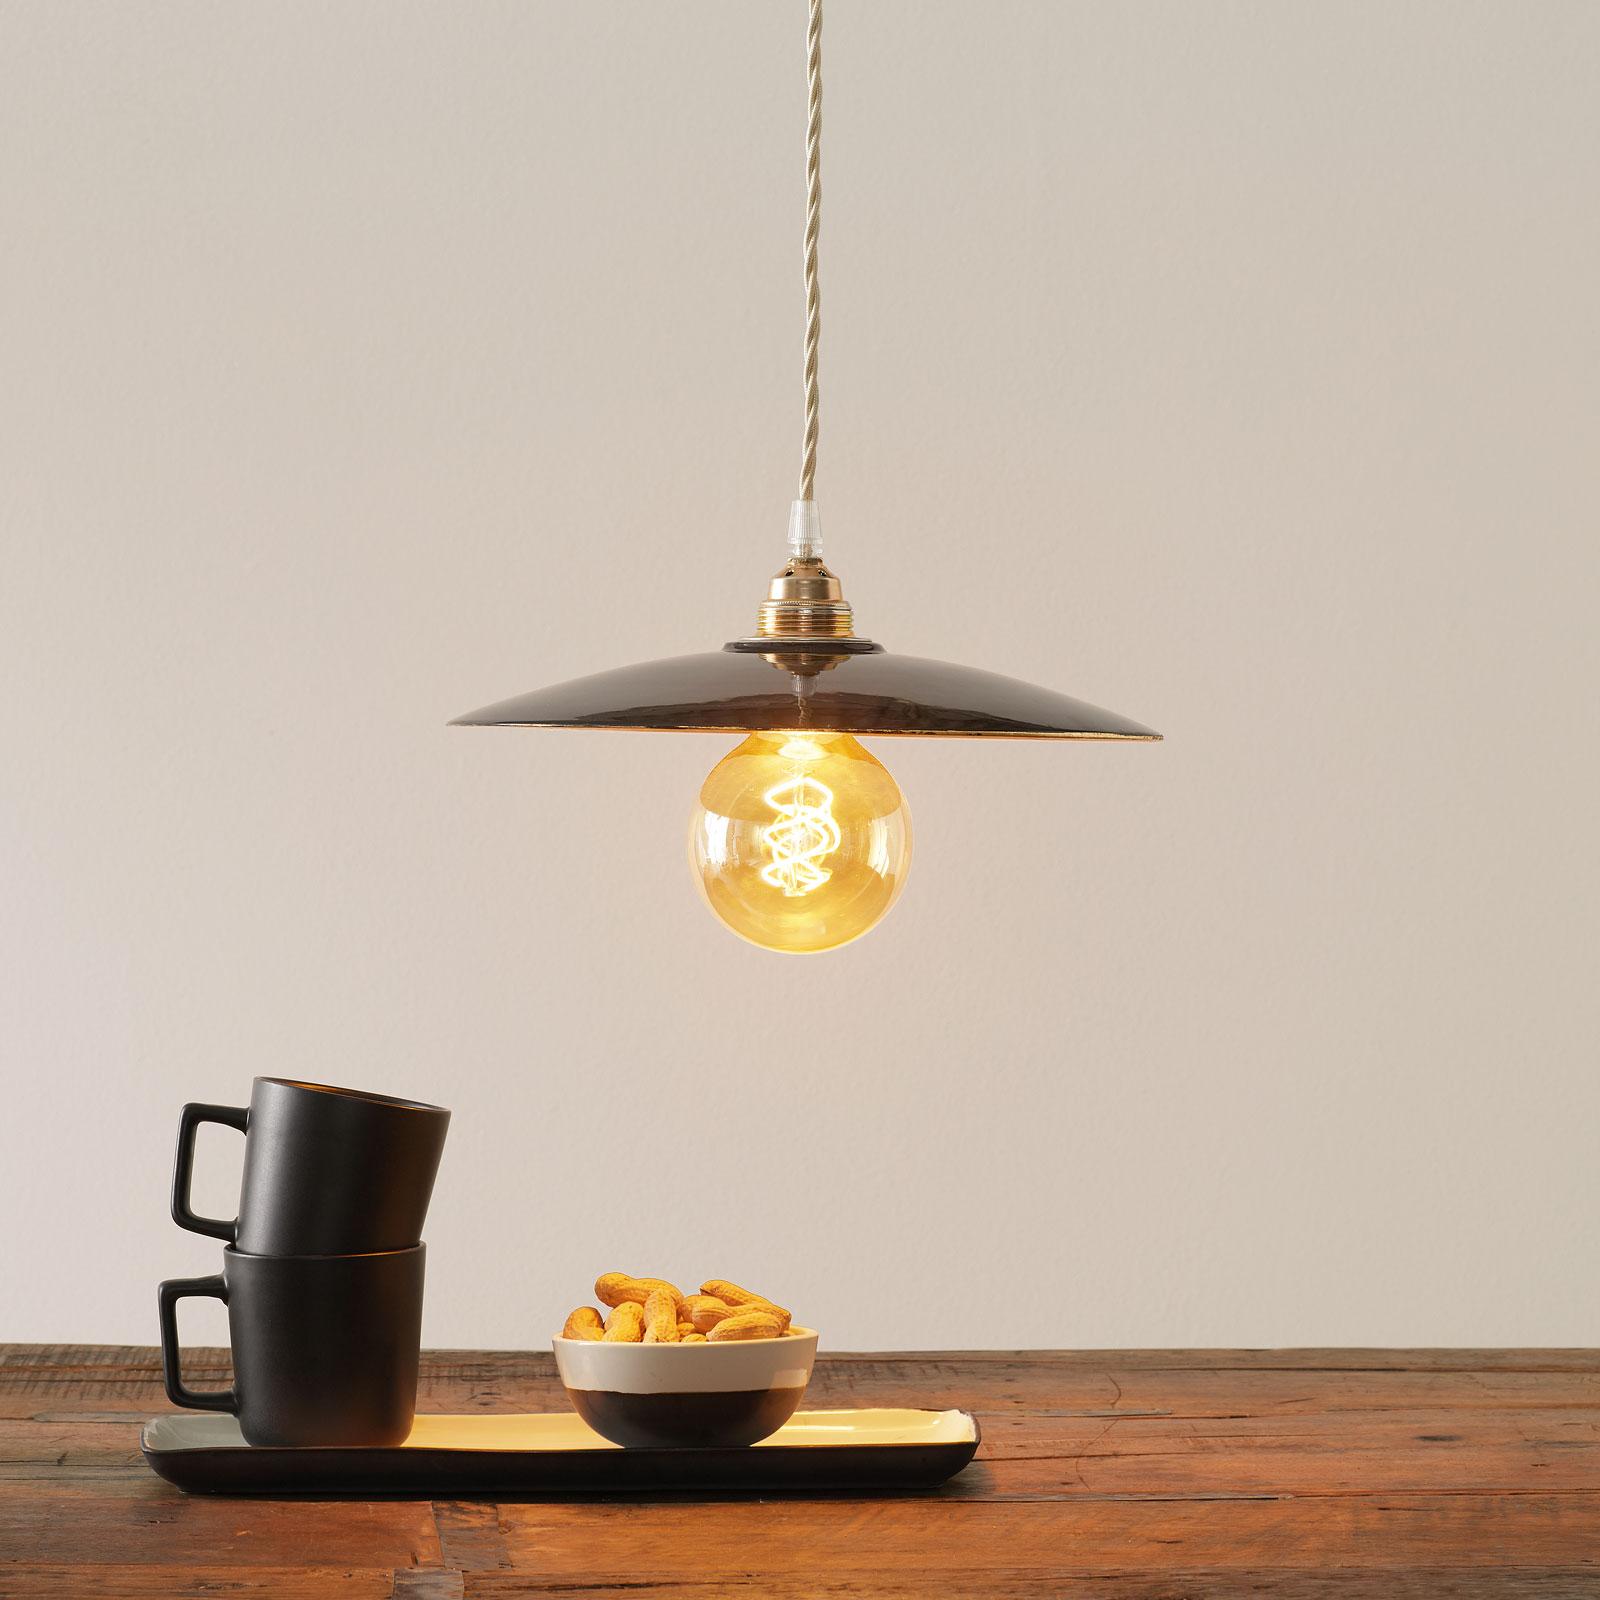 Keramiek-hanglamp S1890, zwart/goud